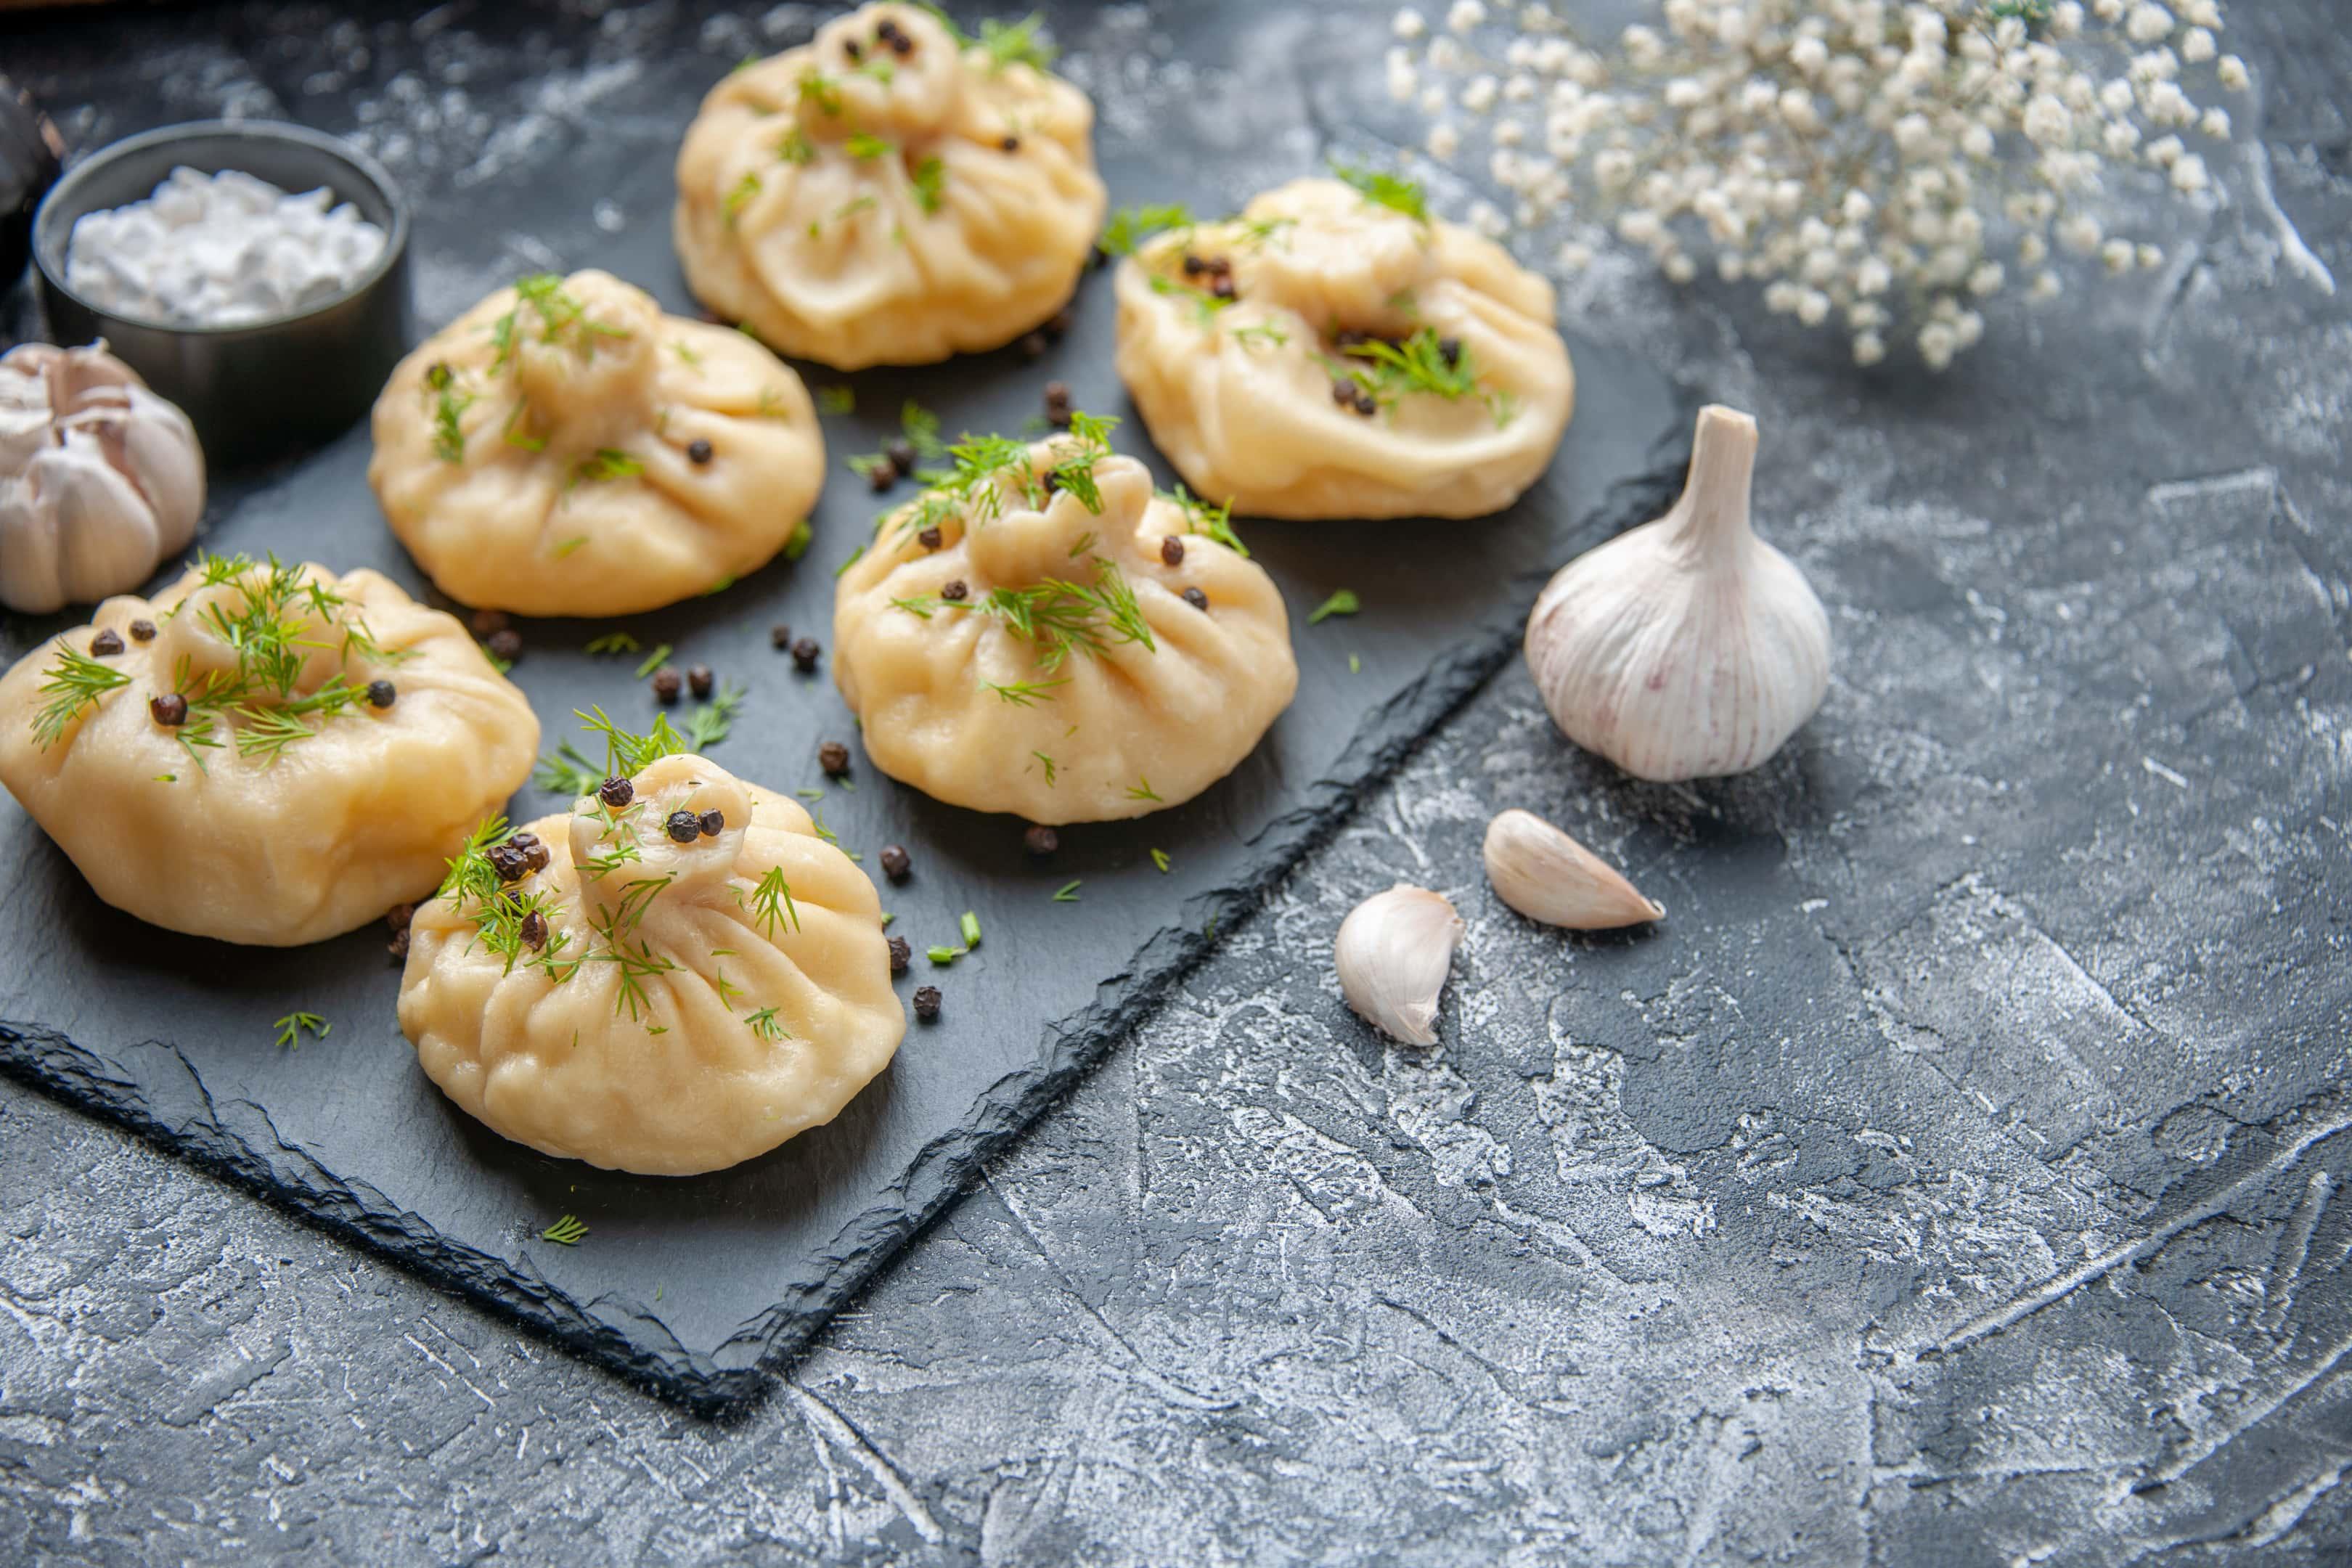 Garlic dumplings on cutting board